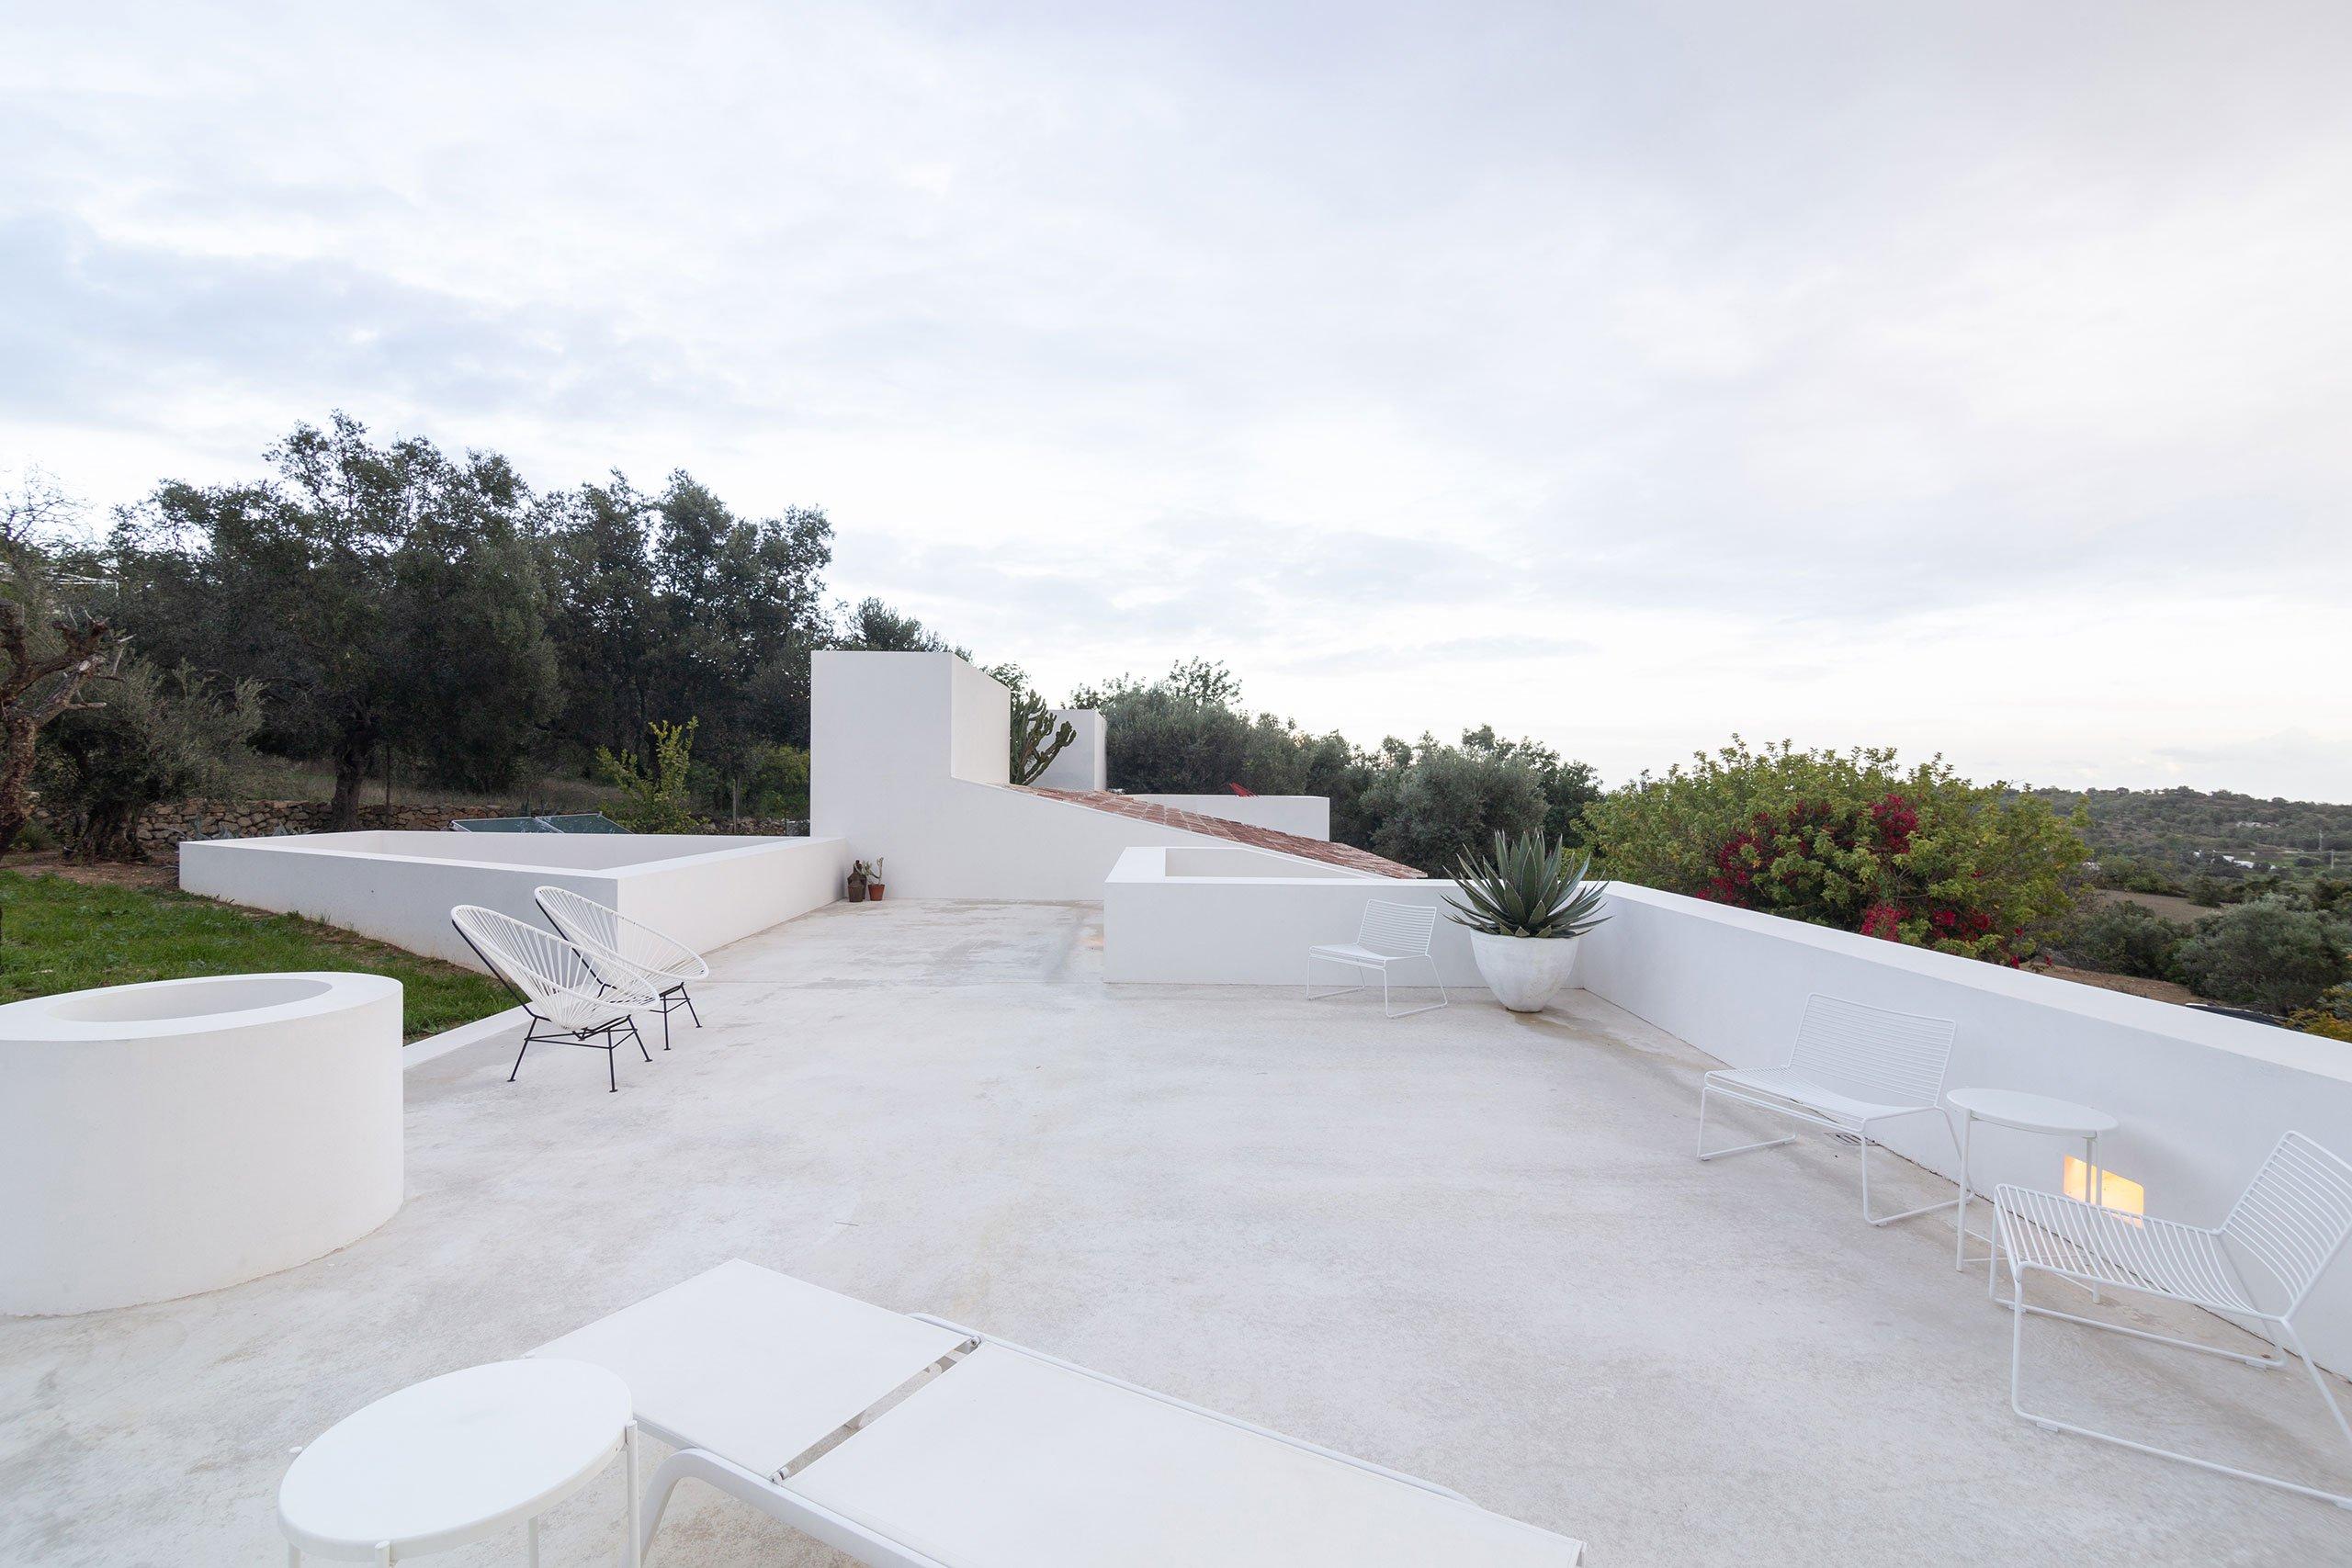 casa-luum-minimalizmus-a-portugal-videken-noko-012.jpg